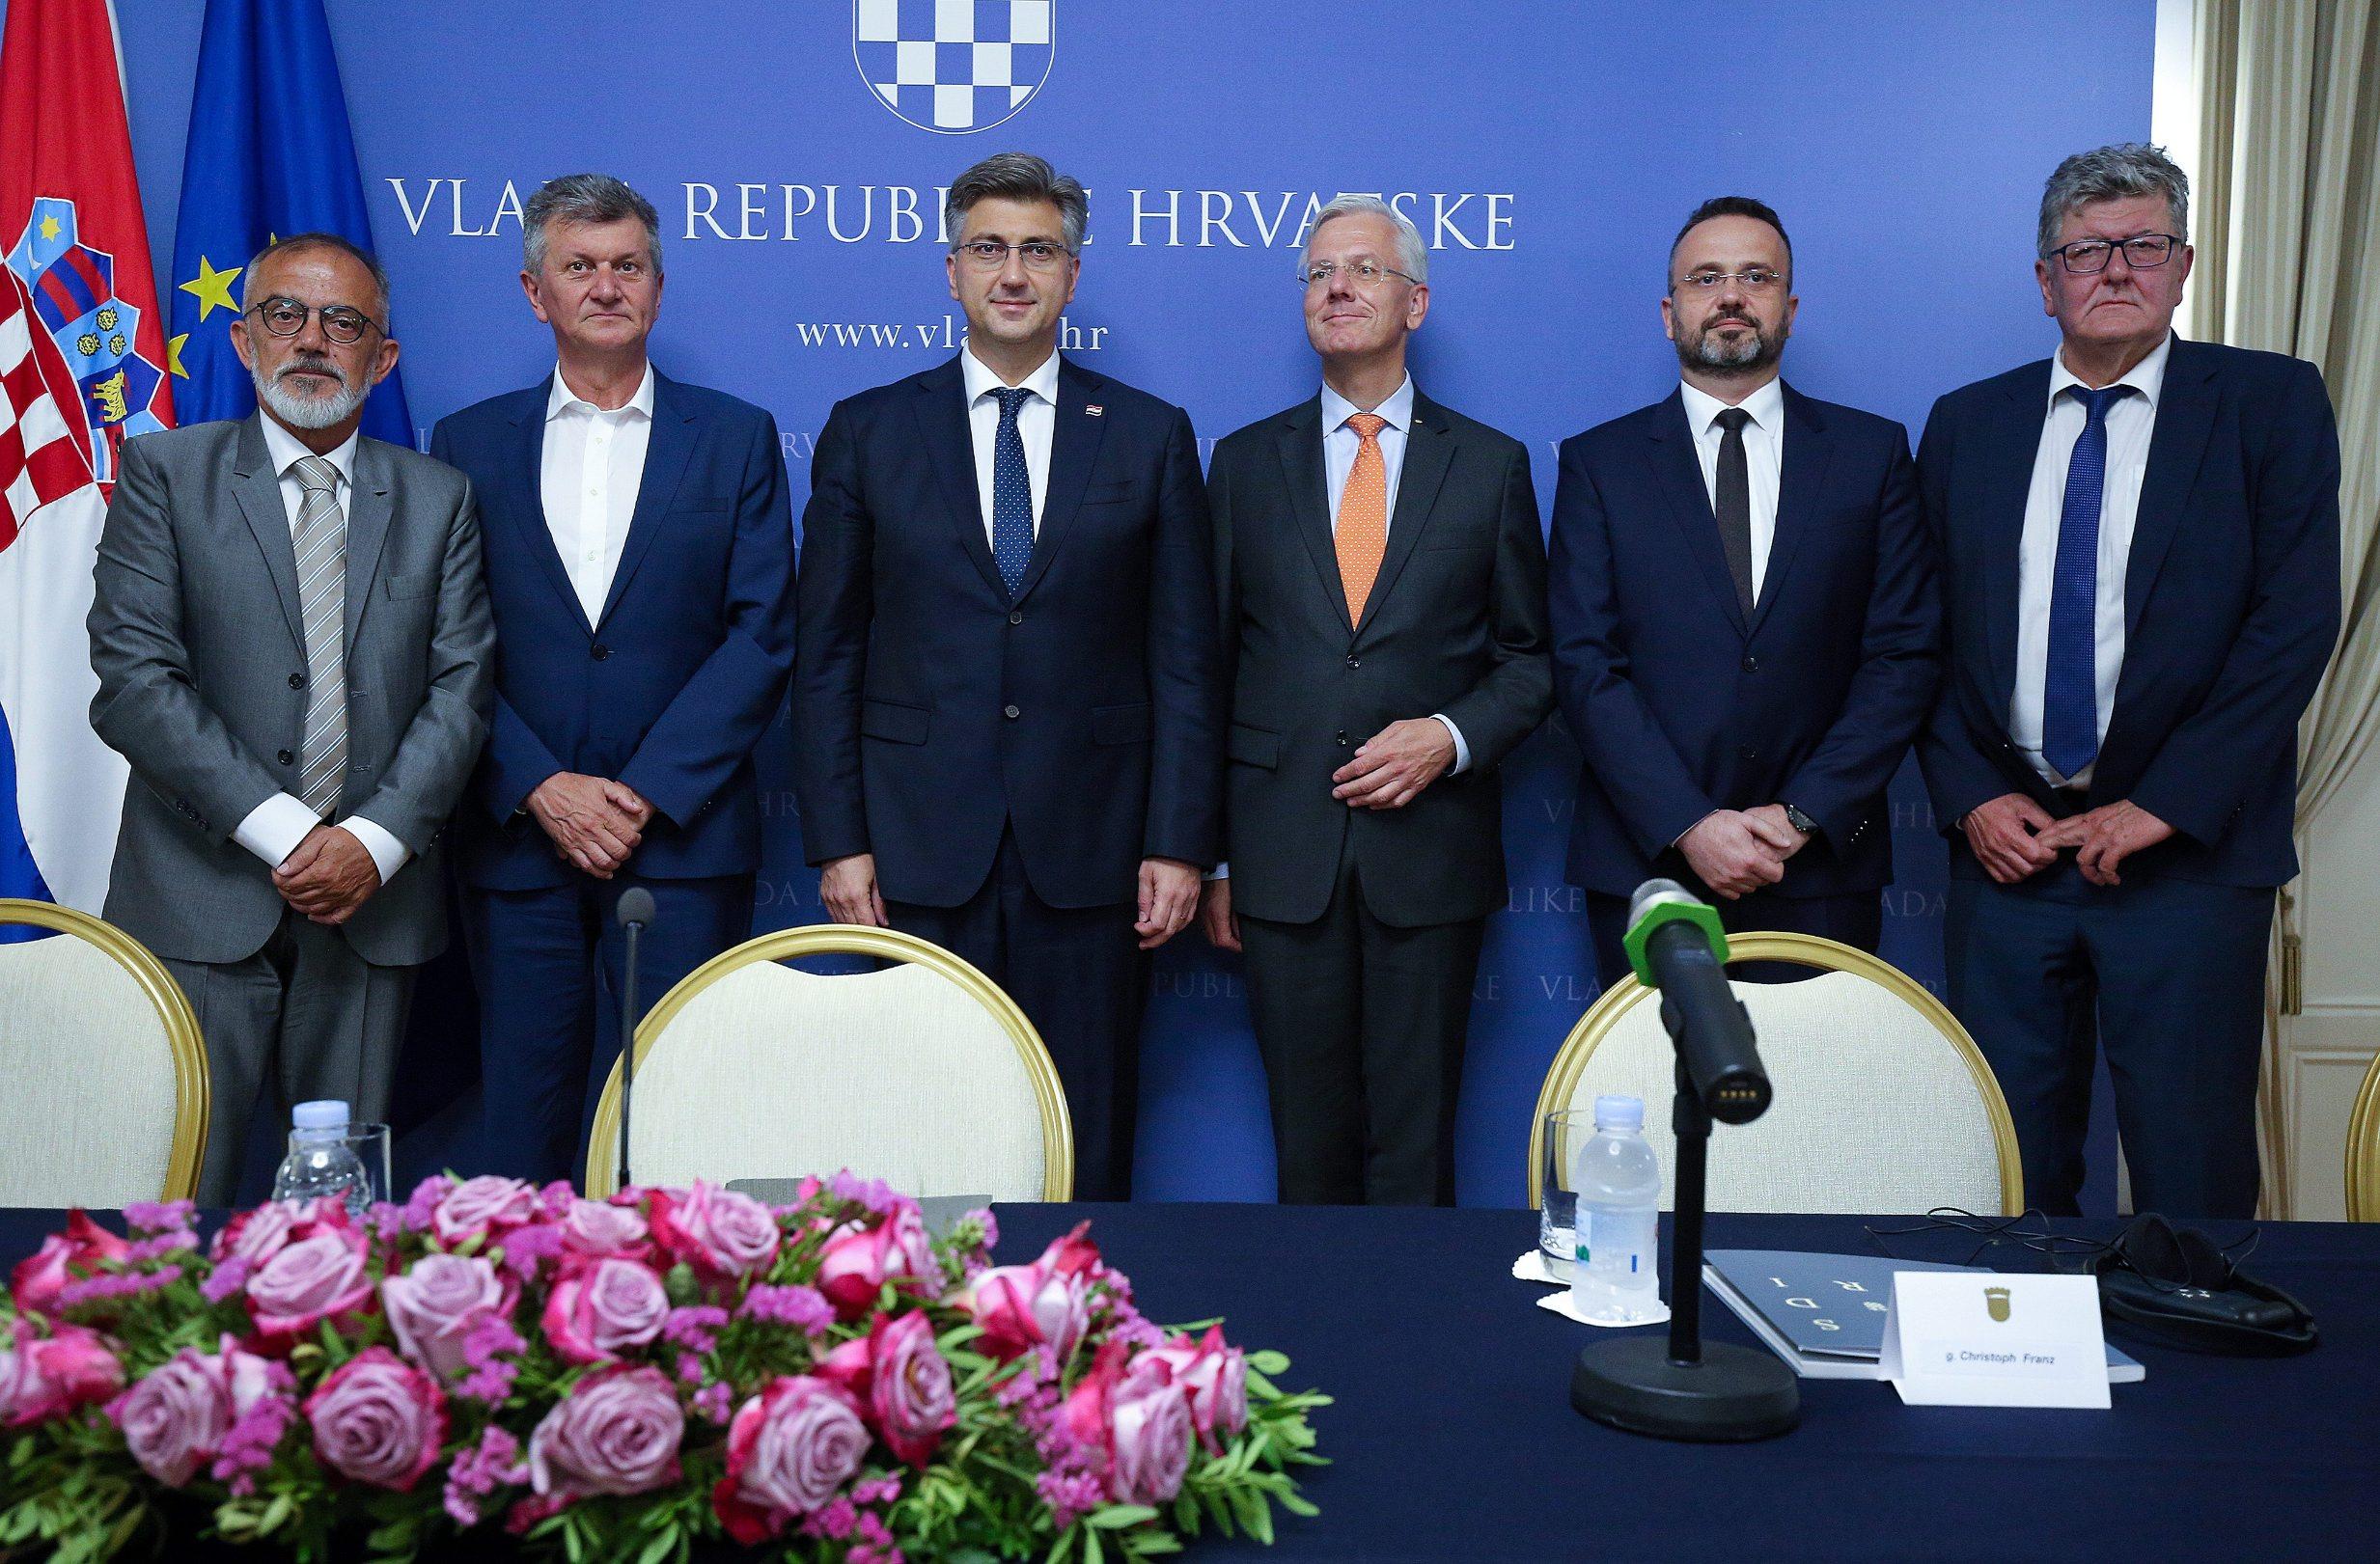 Milorad Gošev, Milan Kujundžić, Andrej Plenković, Christoph Franz, Dražen Jeleč